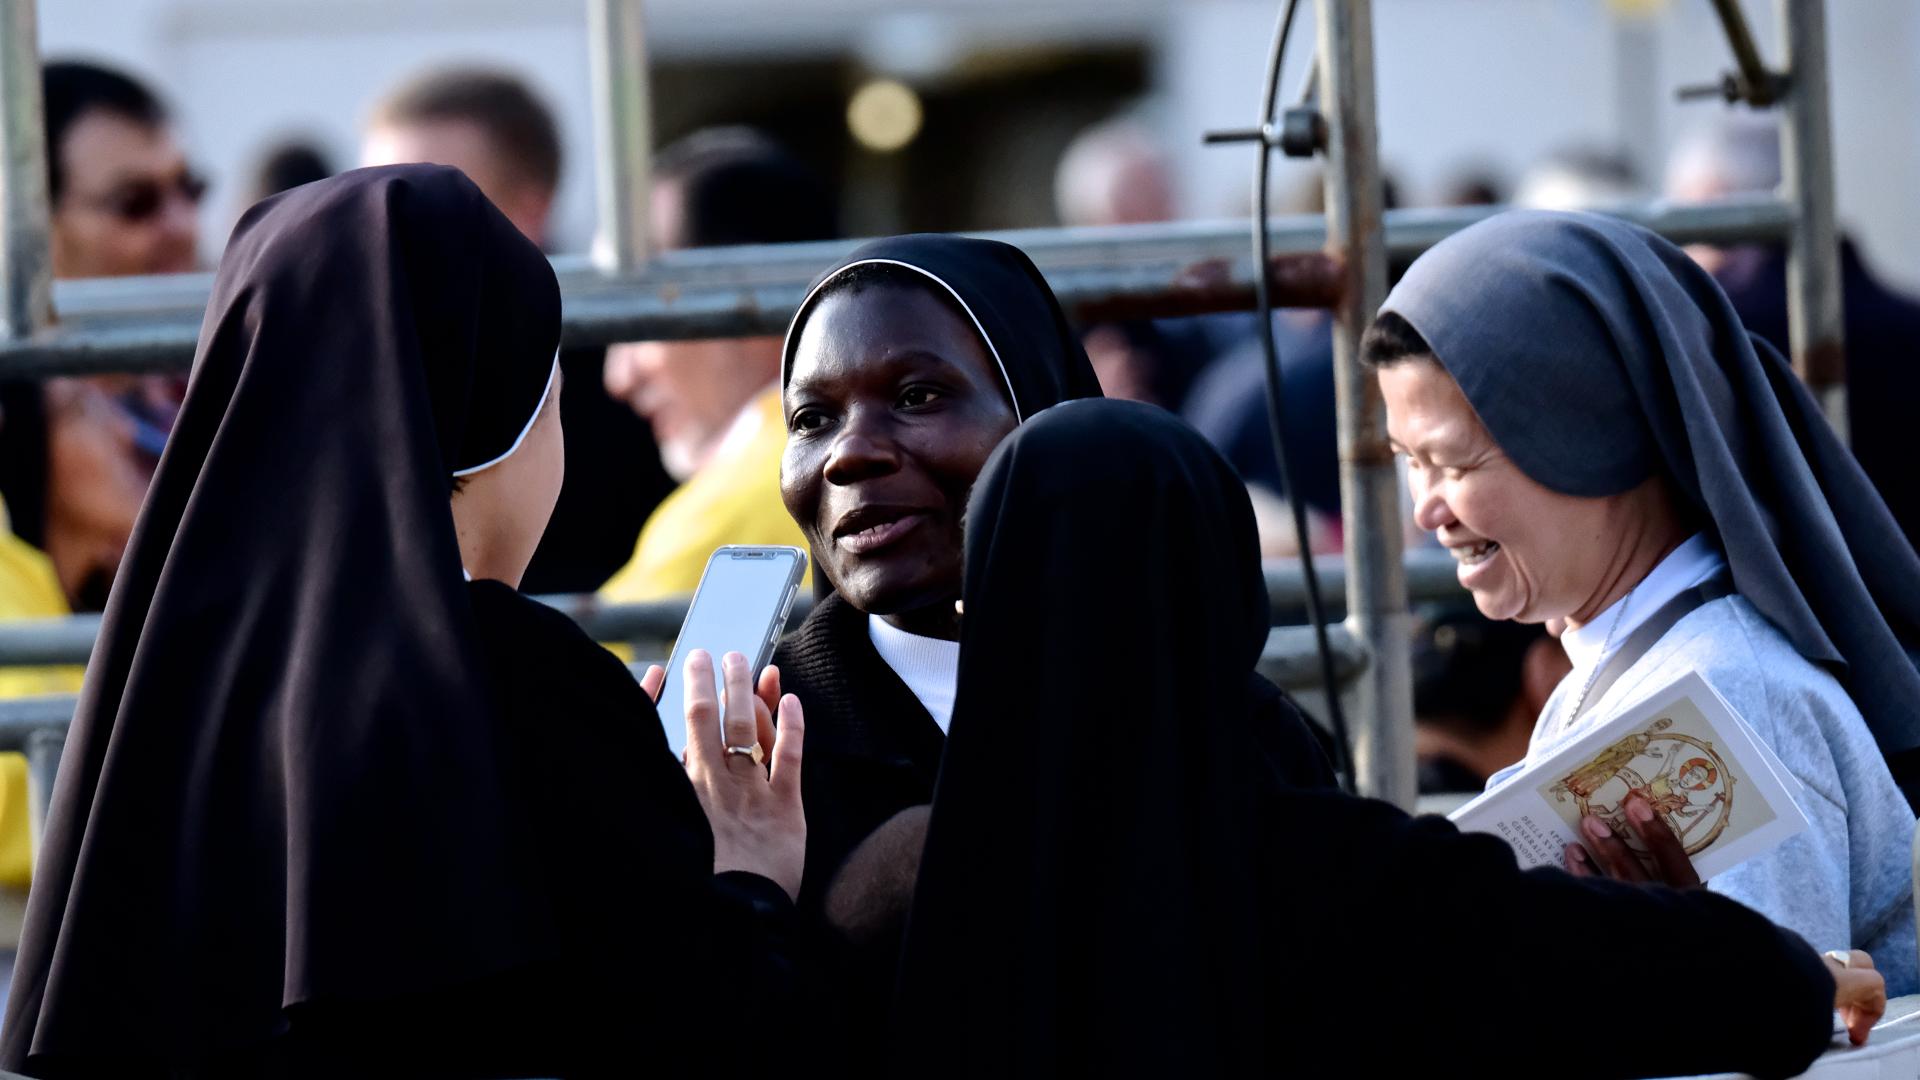 Ordensfrauen an der Jugendsynode in Rom | © Oliver Sittel